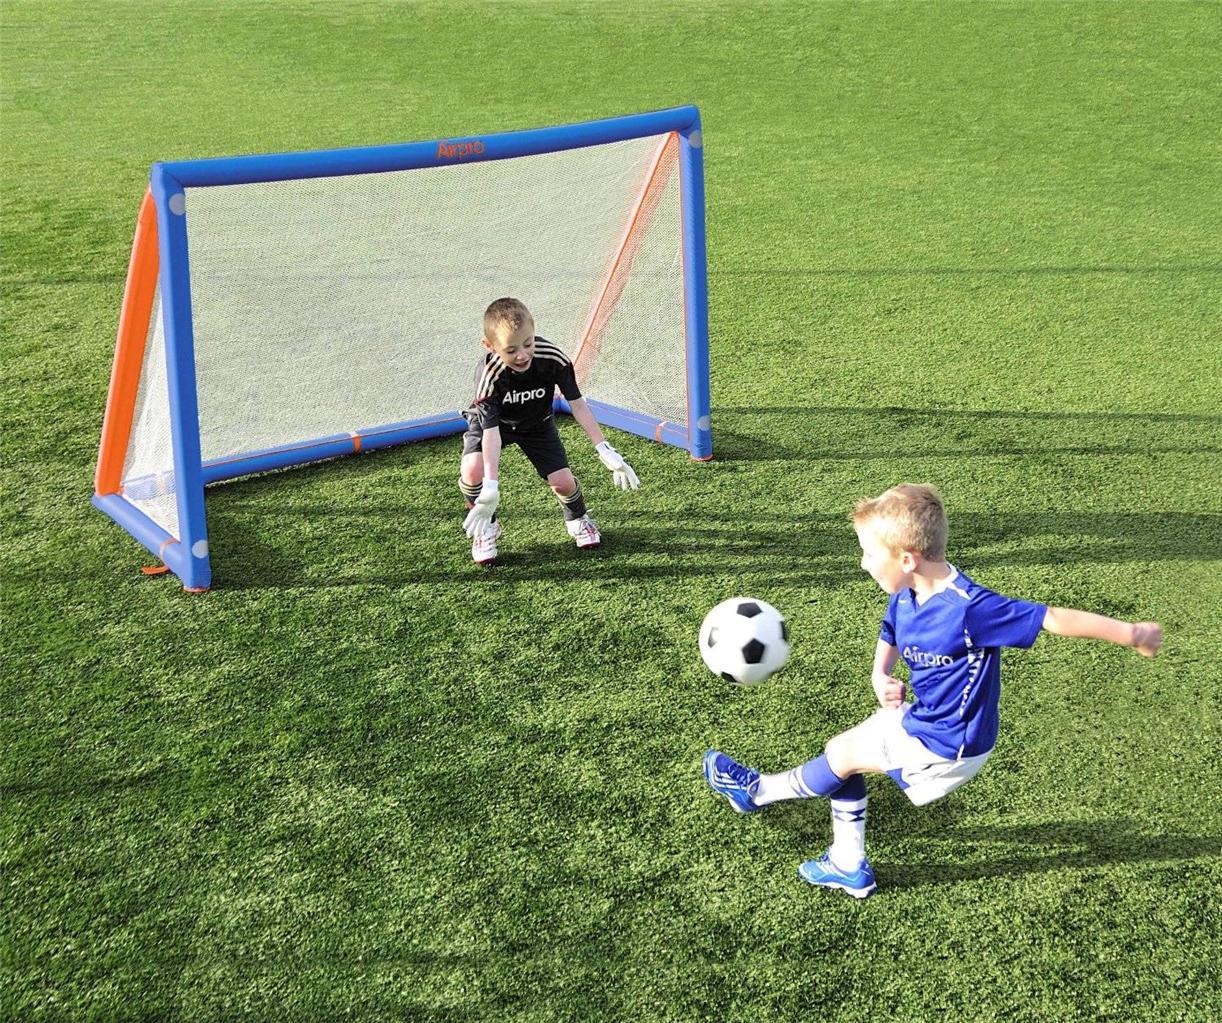 Kids Airpro Goal 6x4ft Inflatable Football Soccer Training Match Post Net Sports Ebay